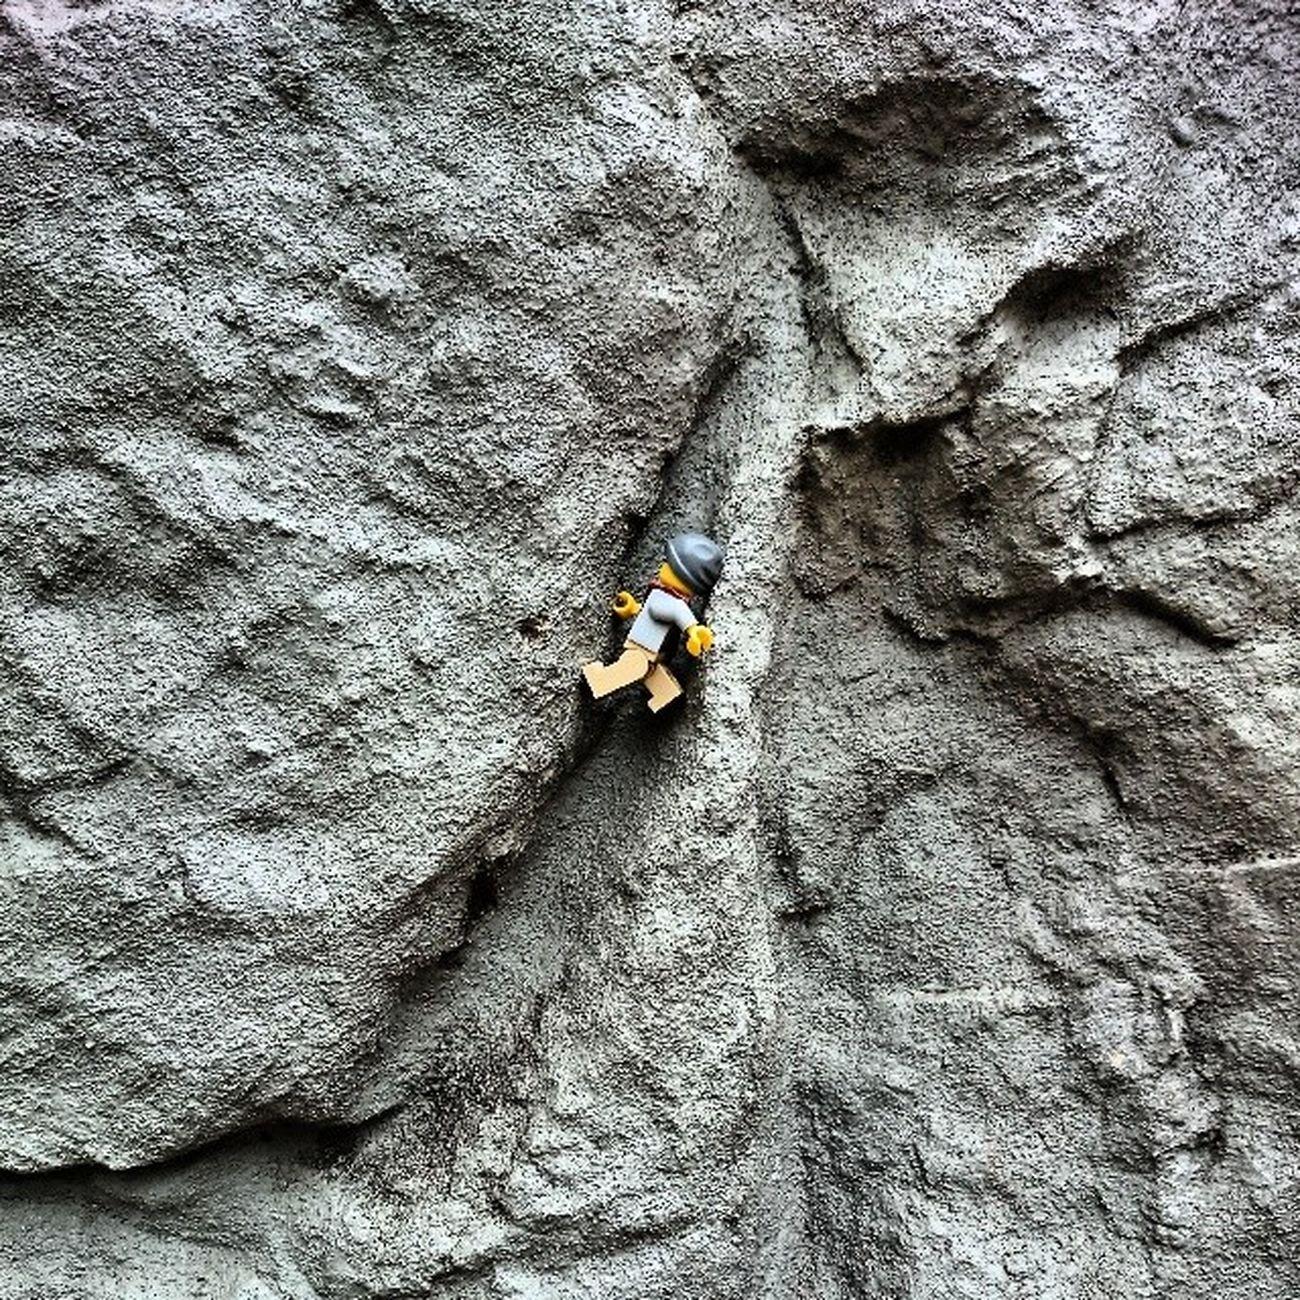 Kamintechnik Beargrylls LEGO Legomovie legoadventure playgroundadventure